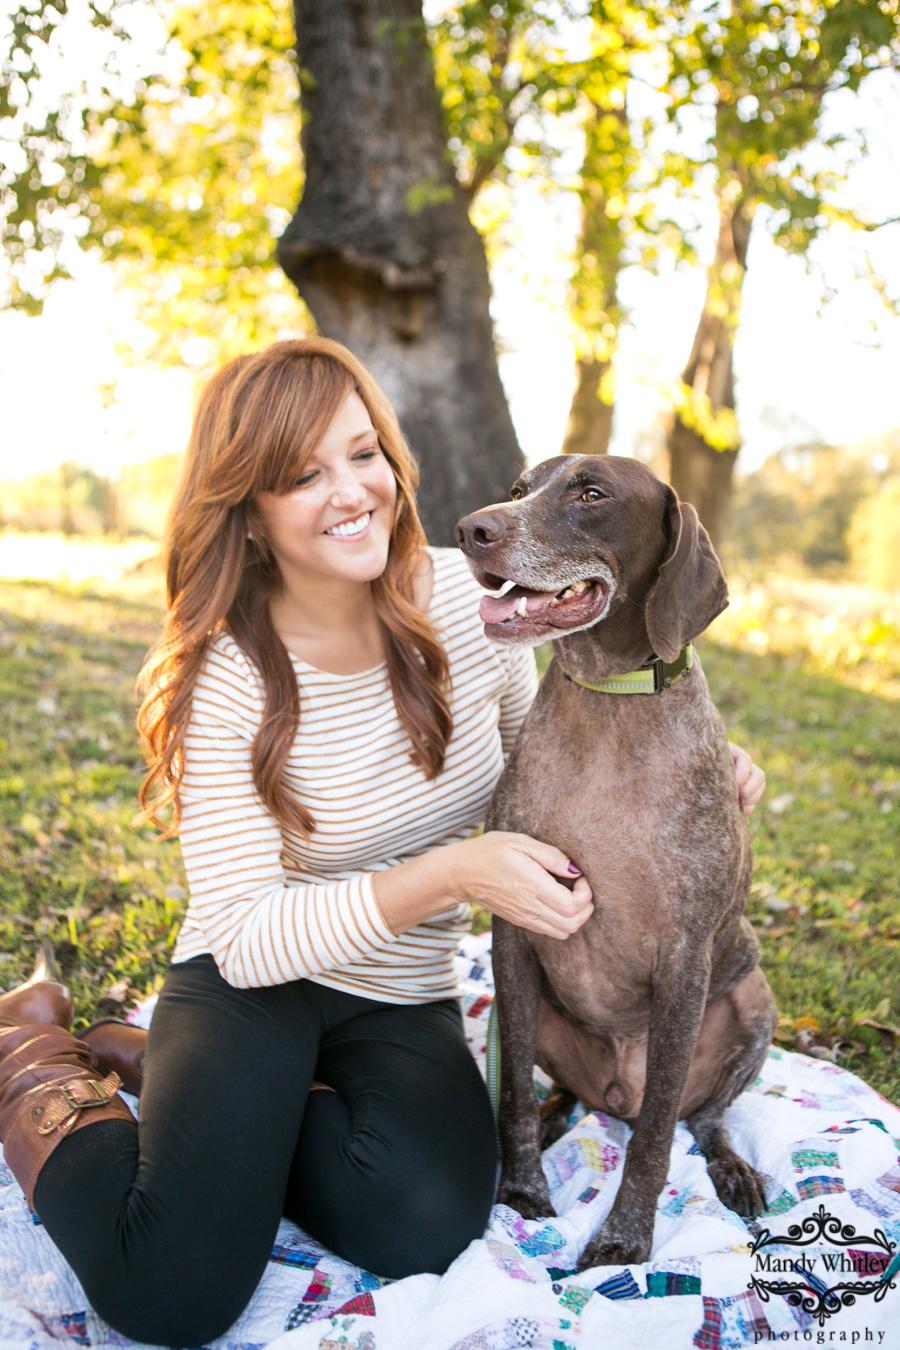 Nashville Pet and Portrait Photographer Mandy Whitley Photography